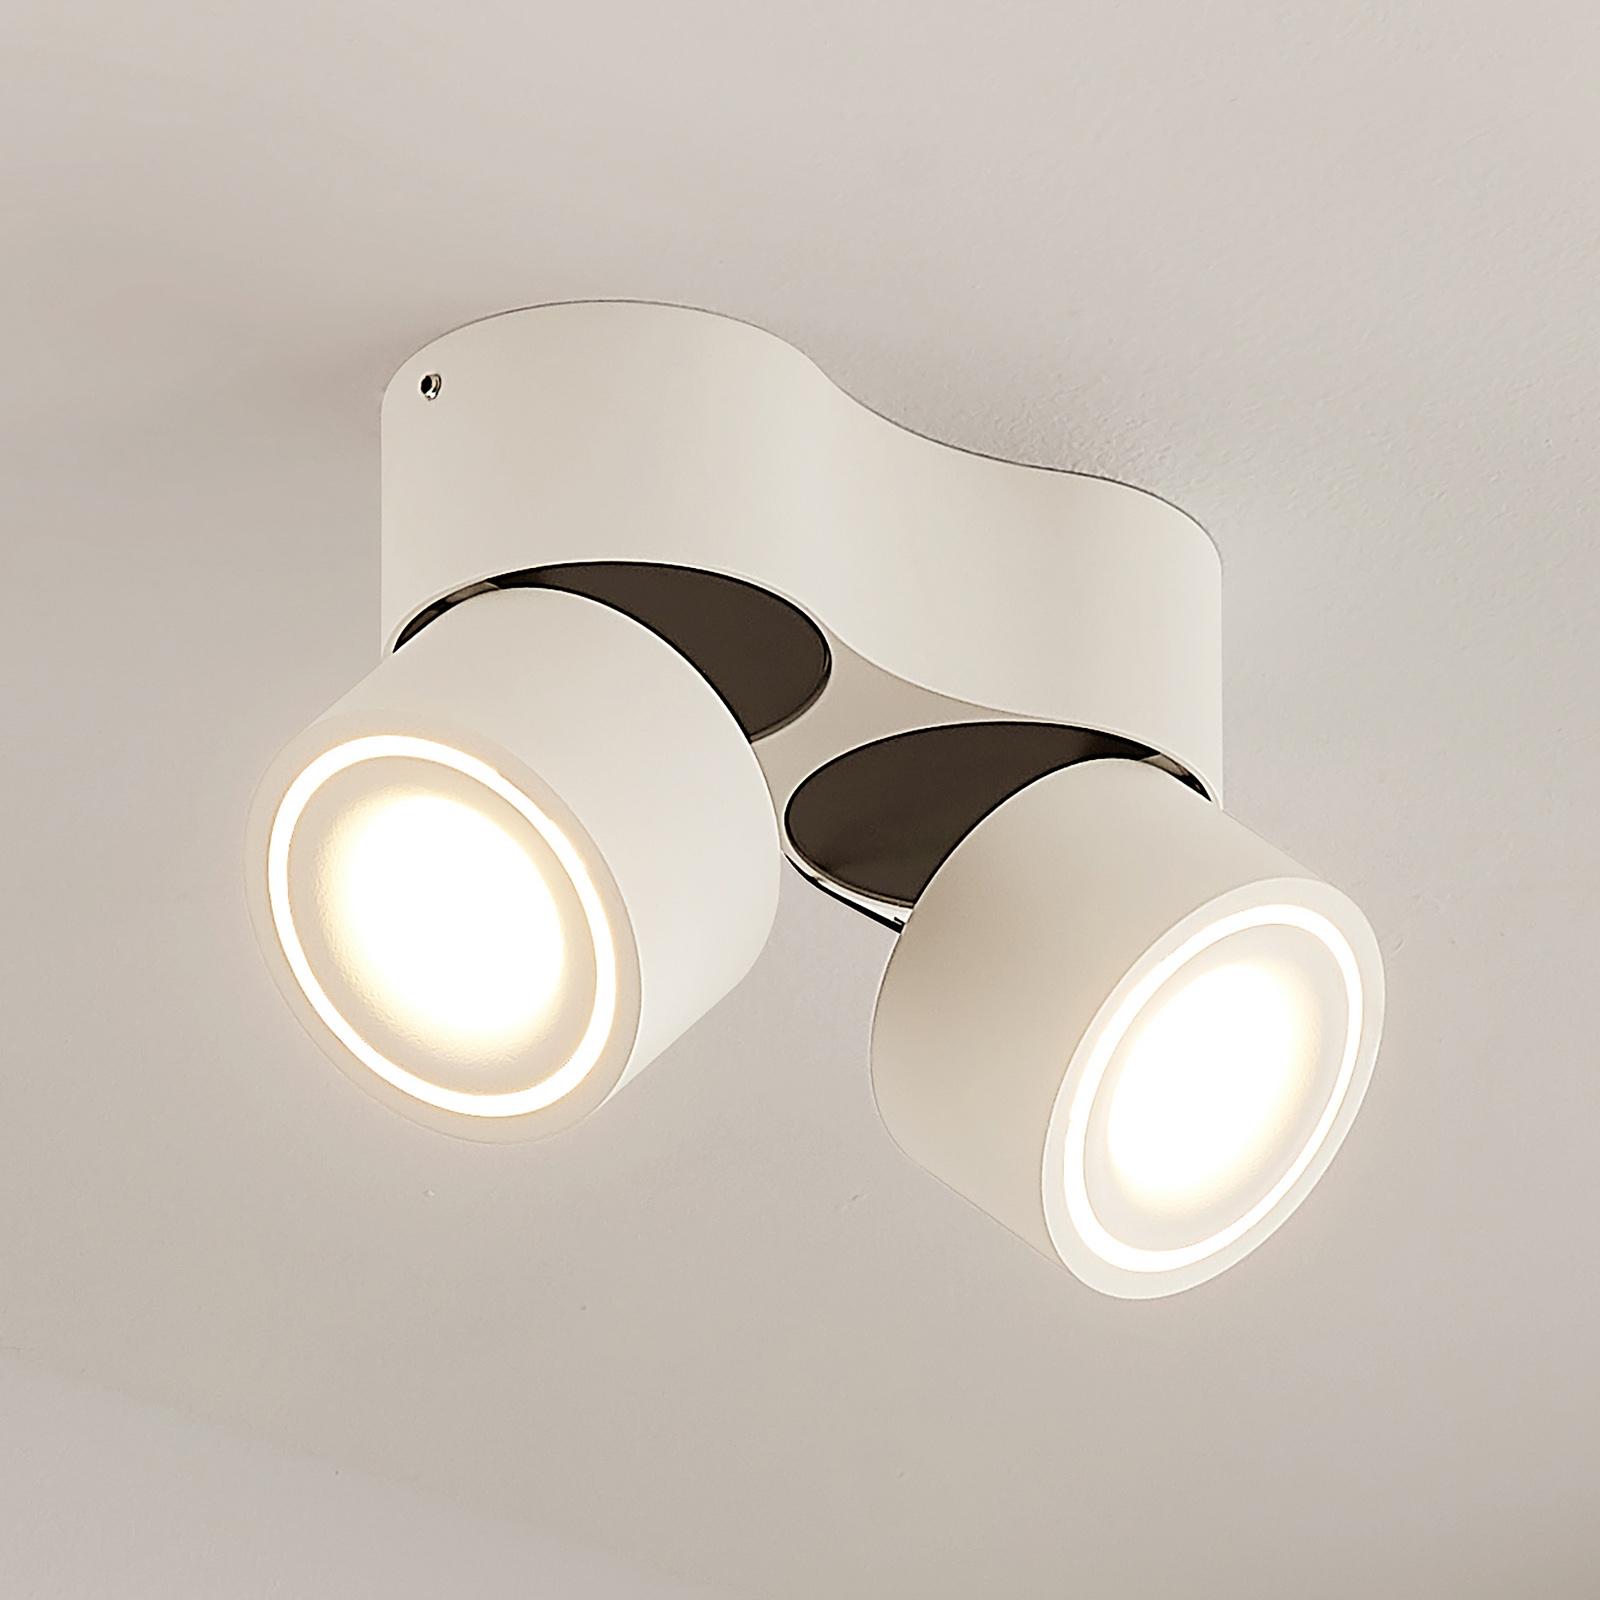 Arcchio Rotari LED-takspot, 2 lyskilder, 2x6,1W